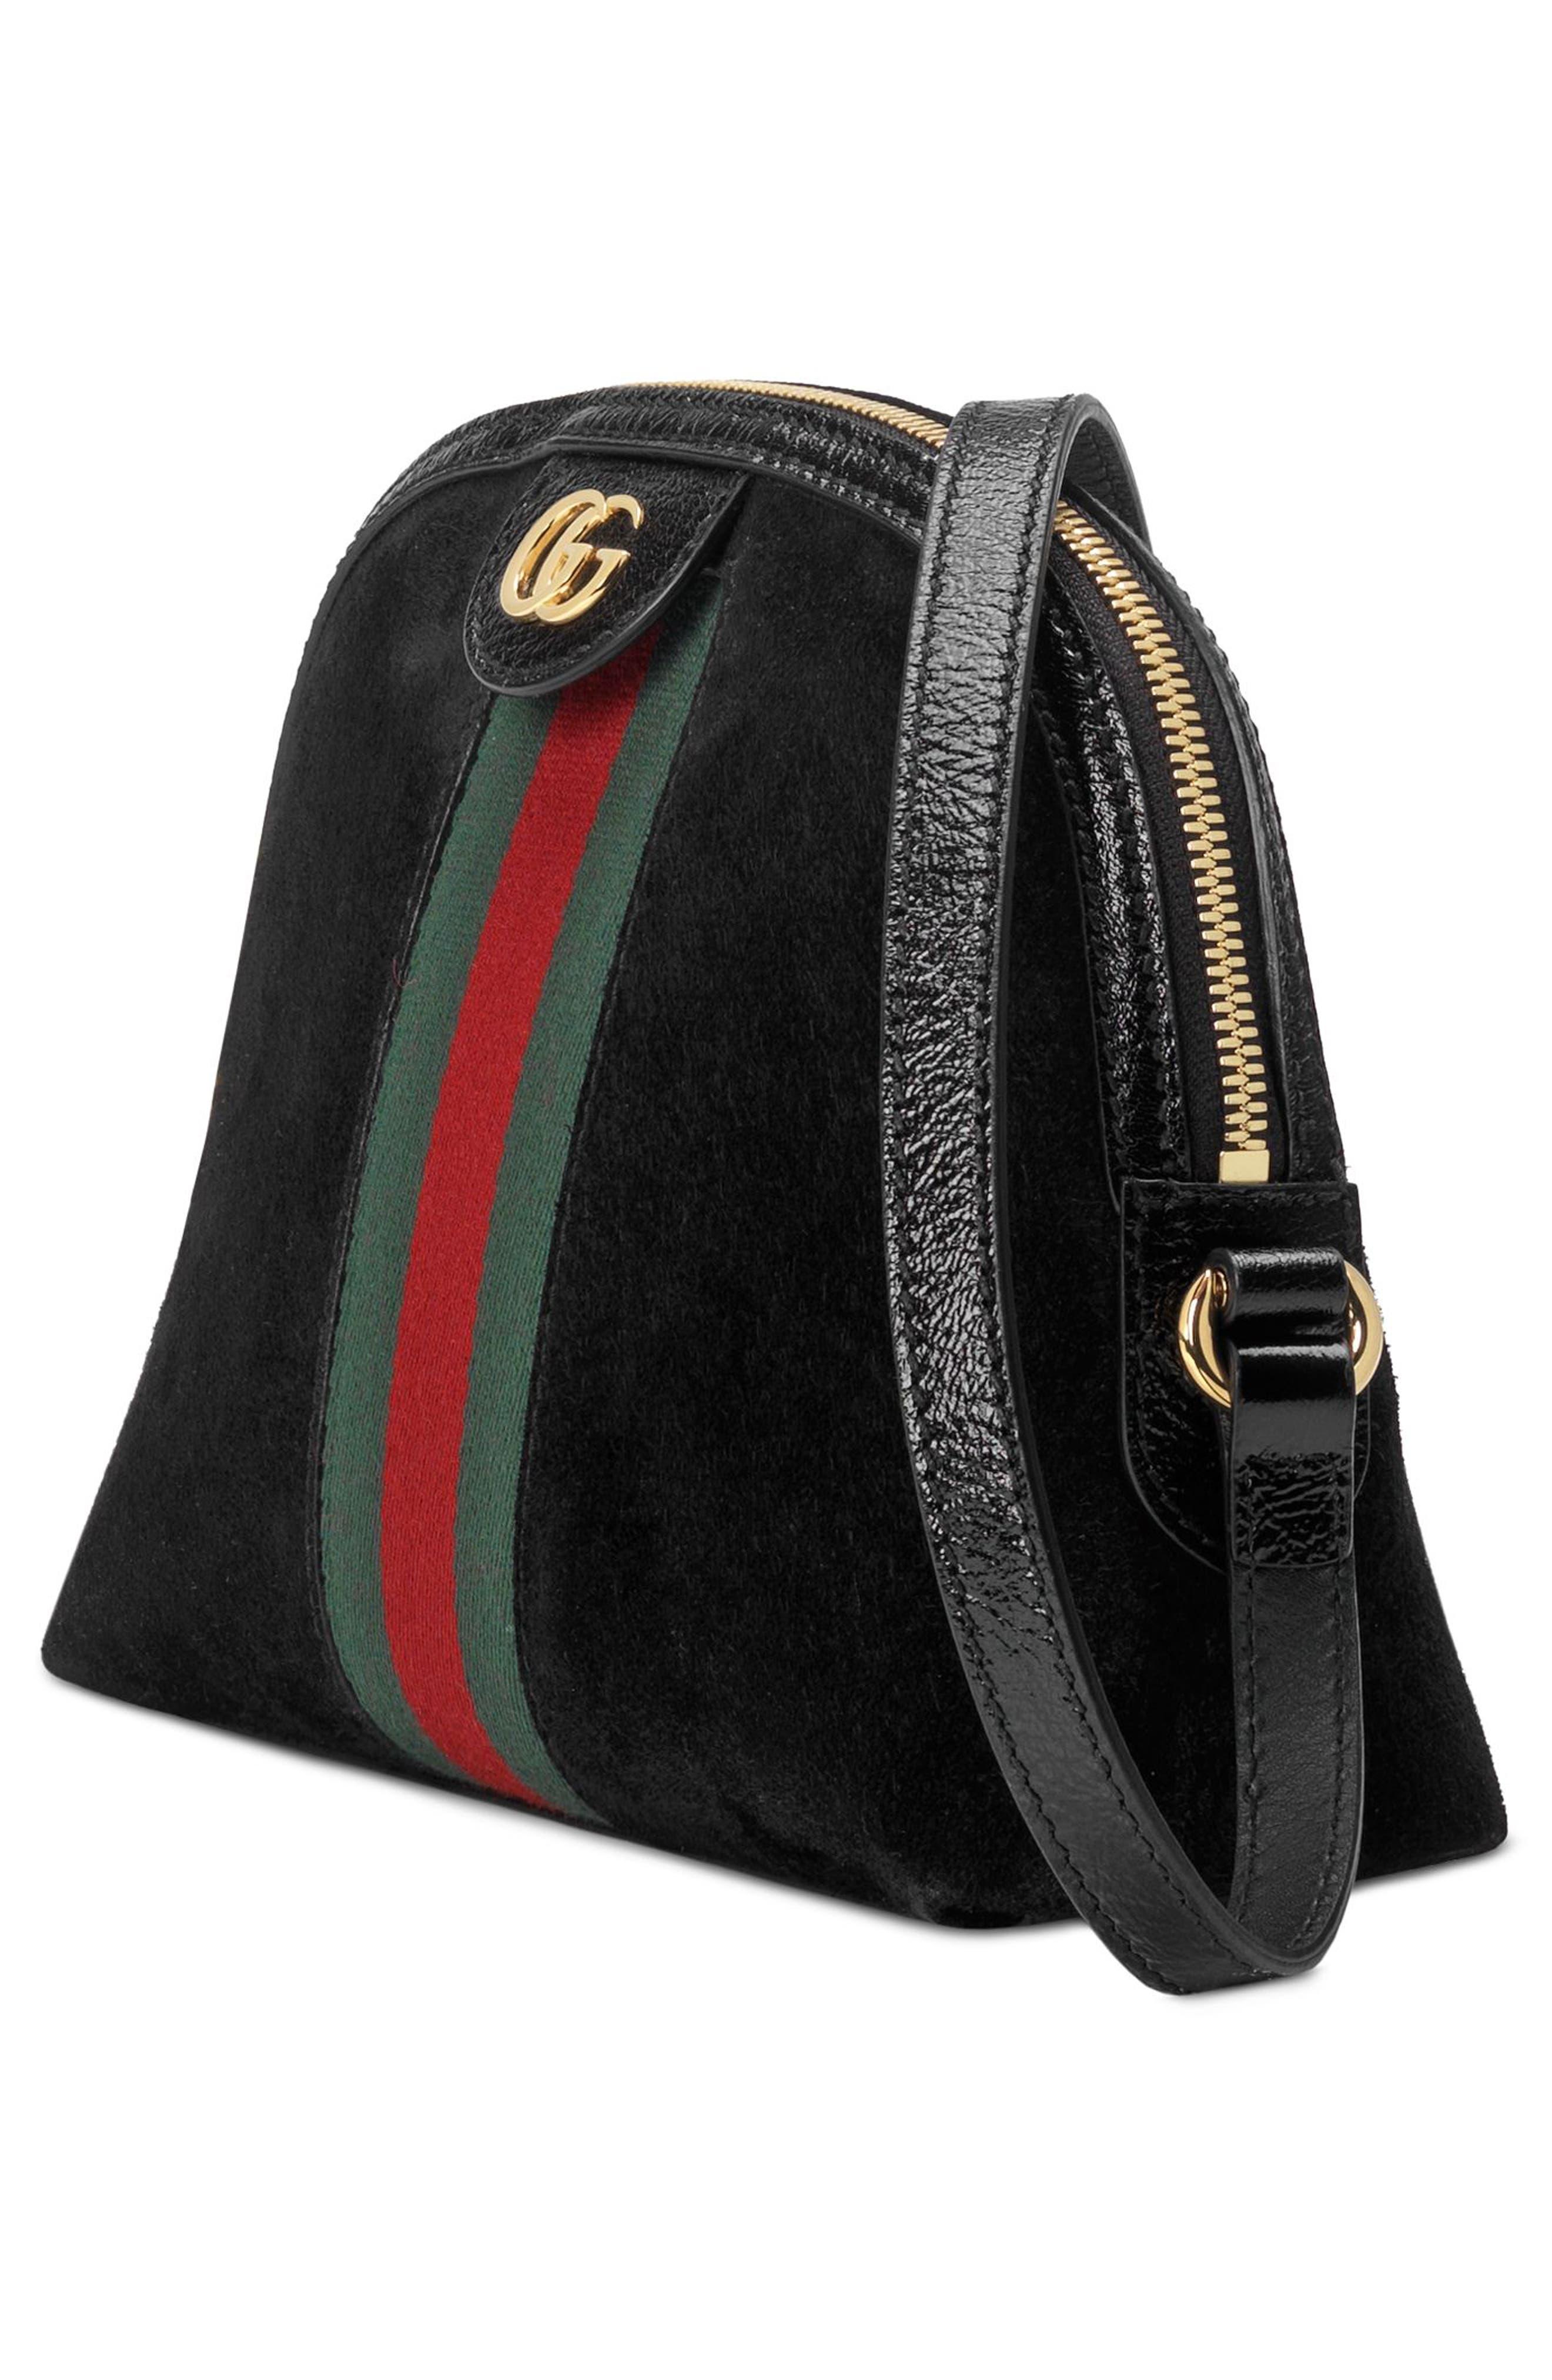 Small Suede Shoulder Bag,                             Alternate thumbnail 4, color,                             NERO/ NERO/ VERT RED VERT